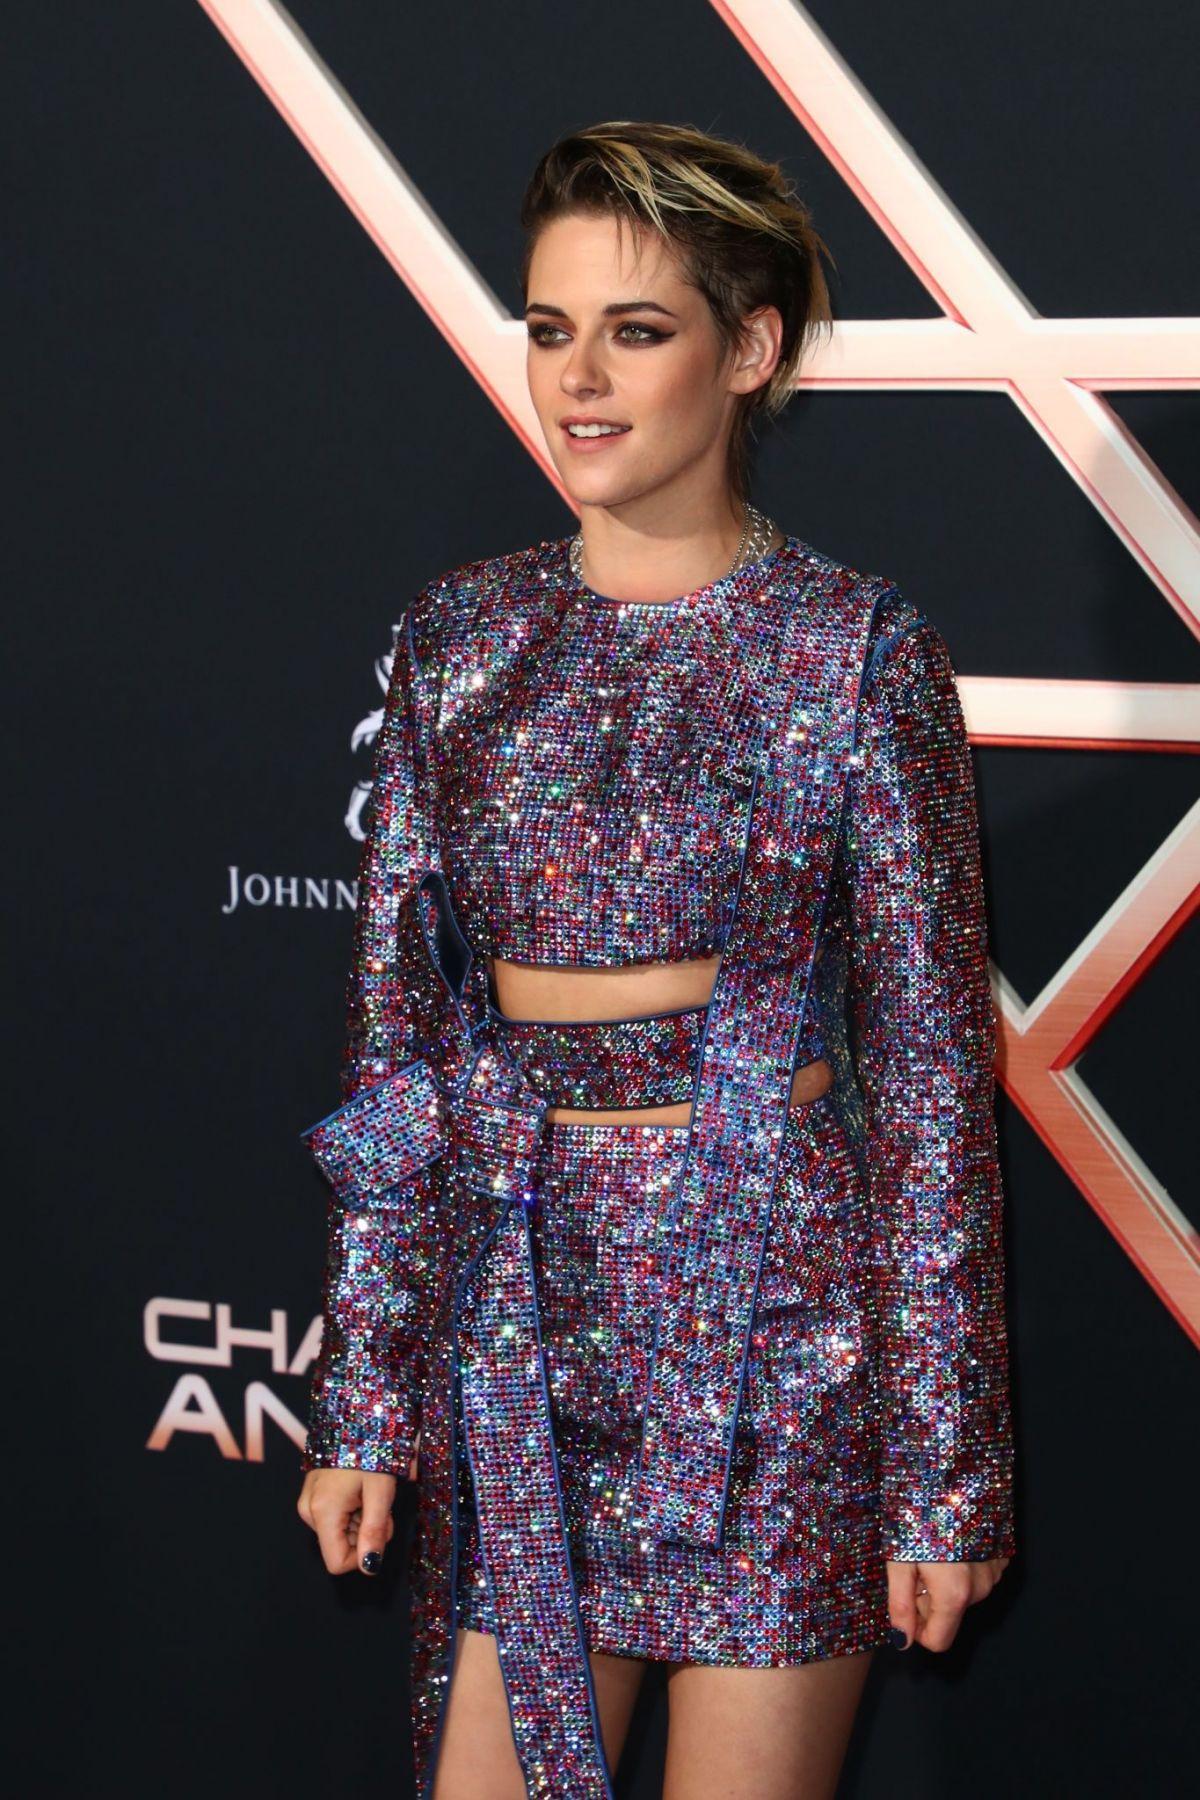 Kristen at Charlie's anjos premiere